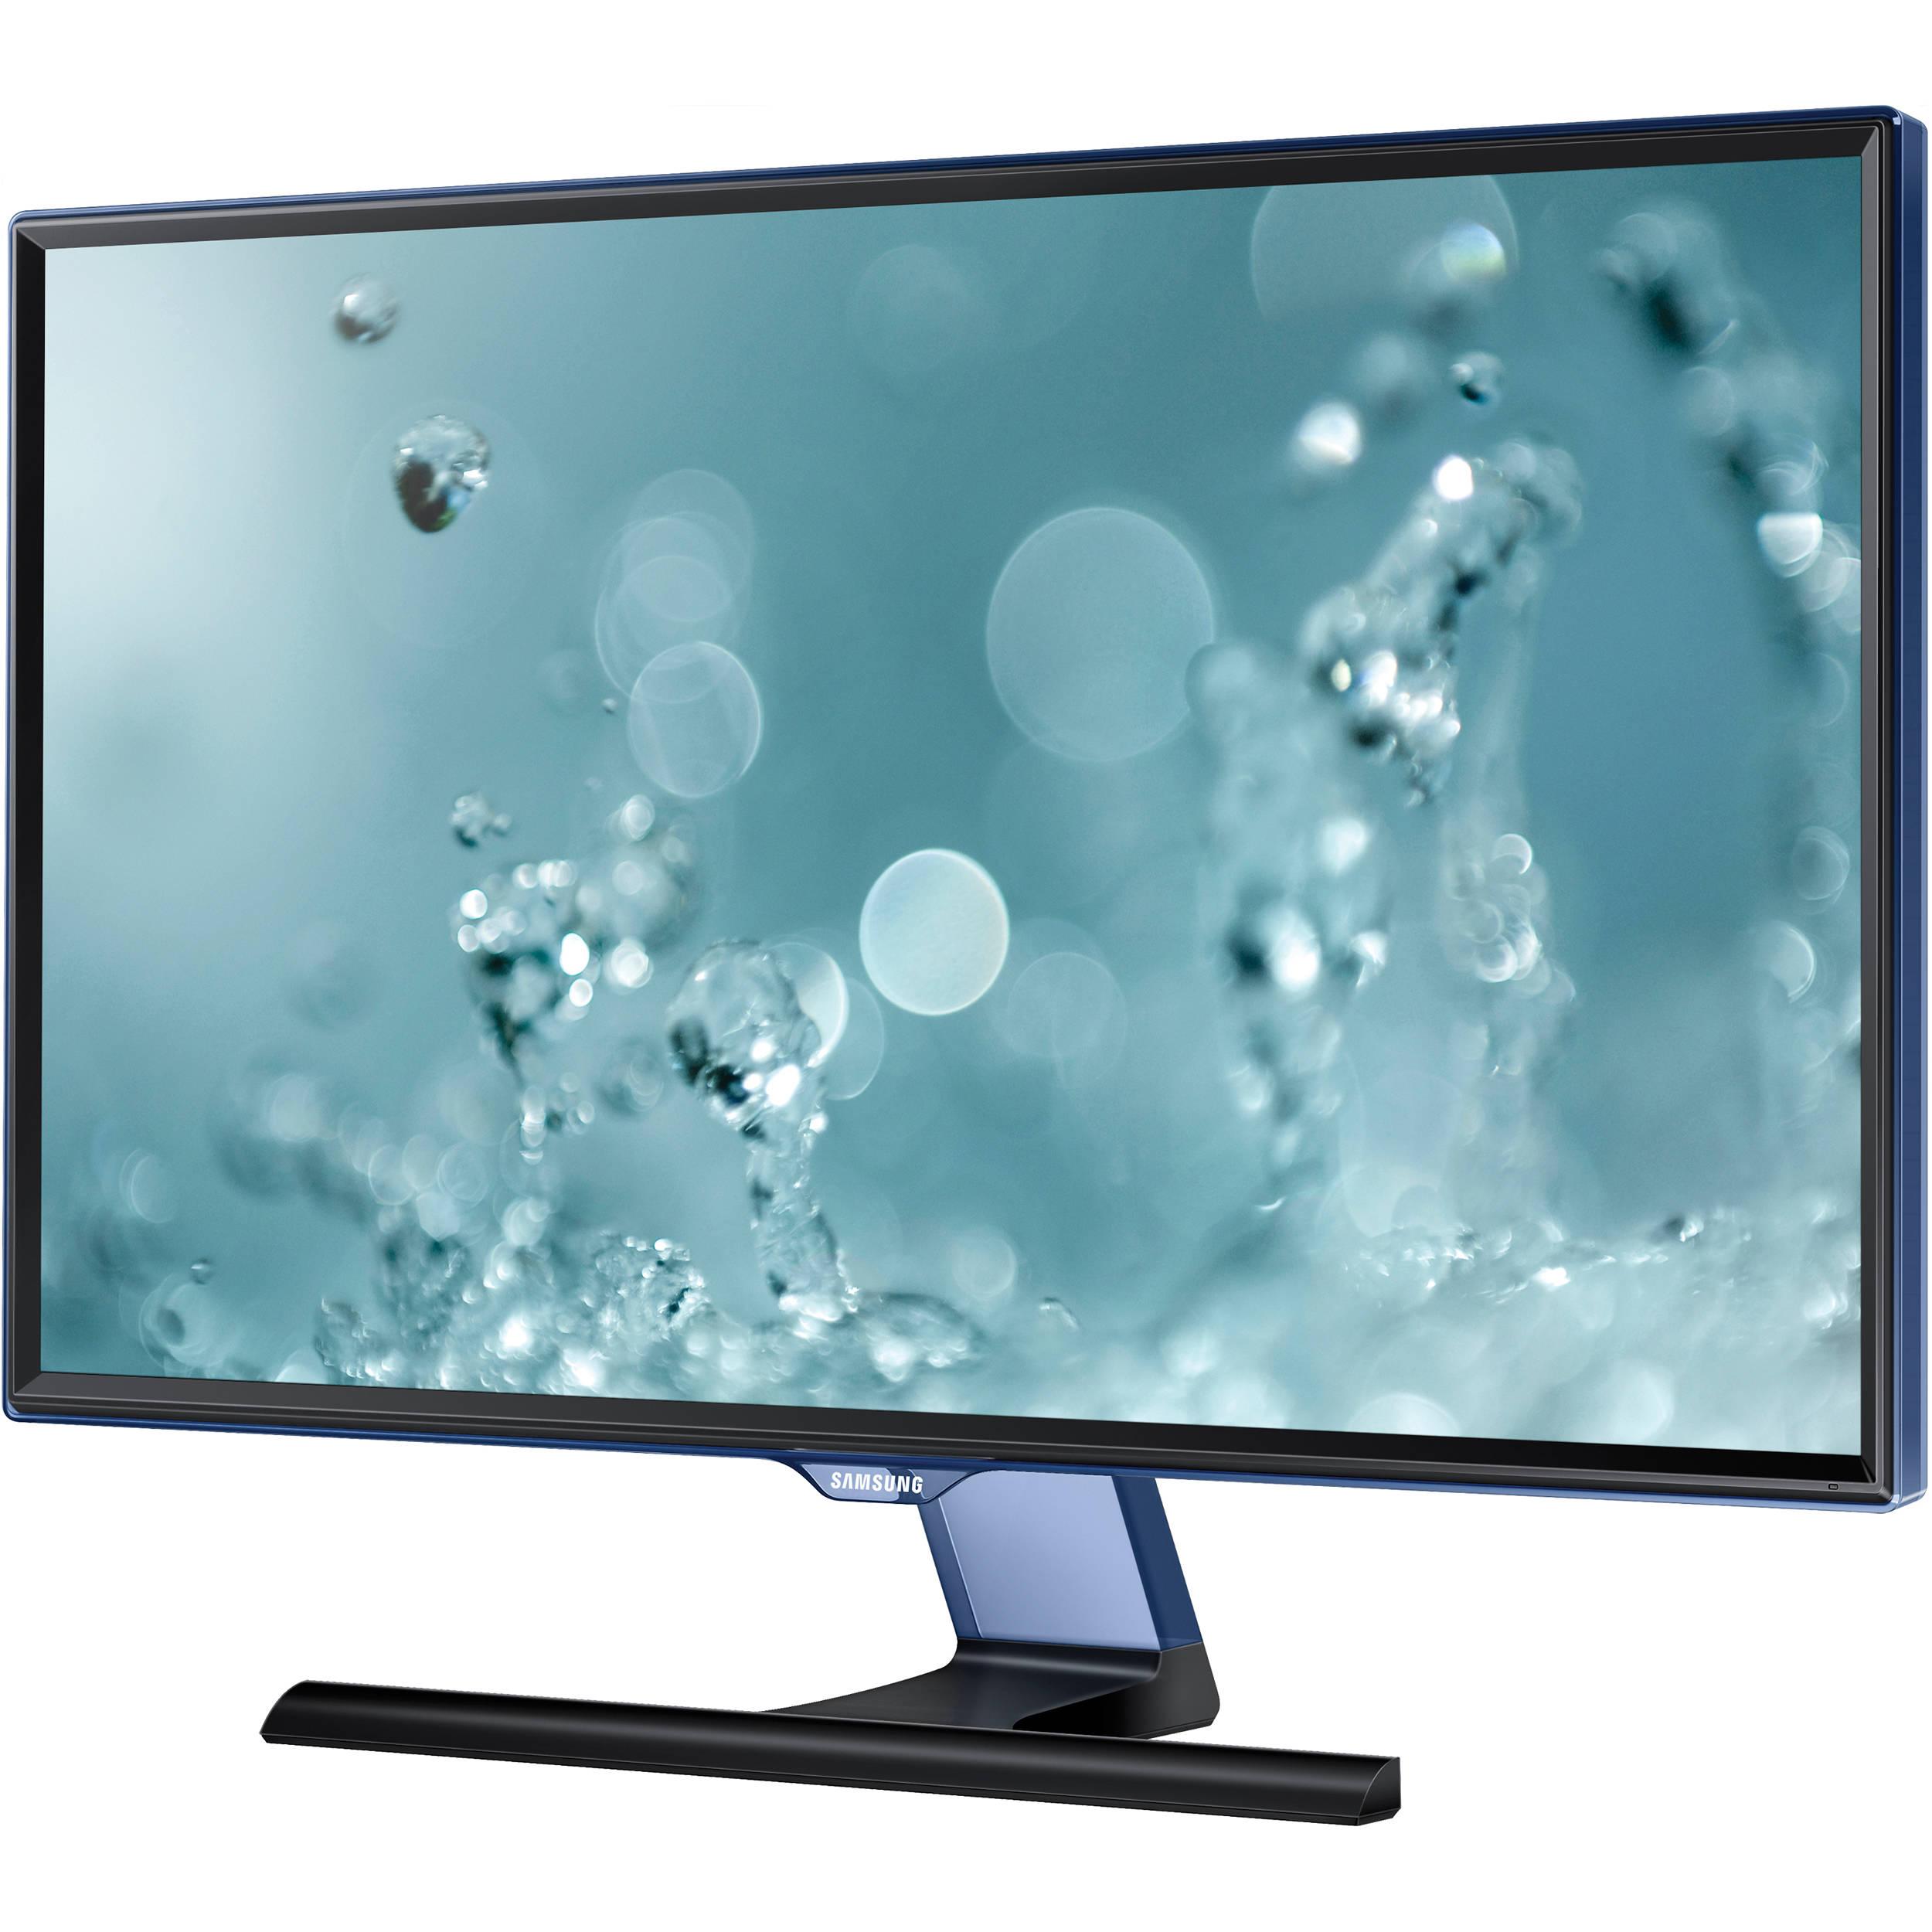 samsung s27e390h 27 widescreen led backlit lcd s27e390h. Black Bedroom Furniture Sets. Home Design Ideas